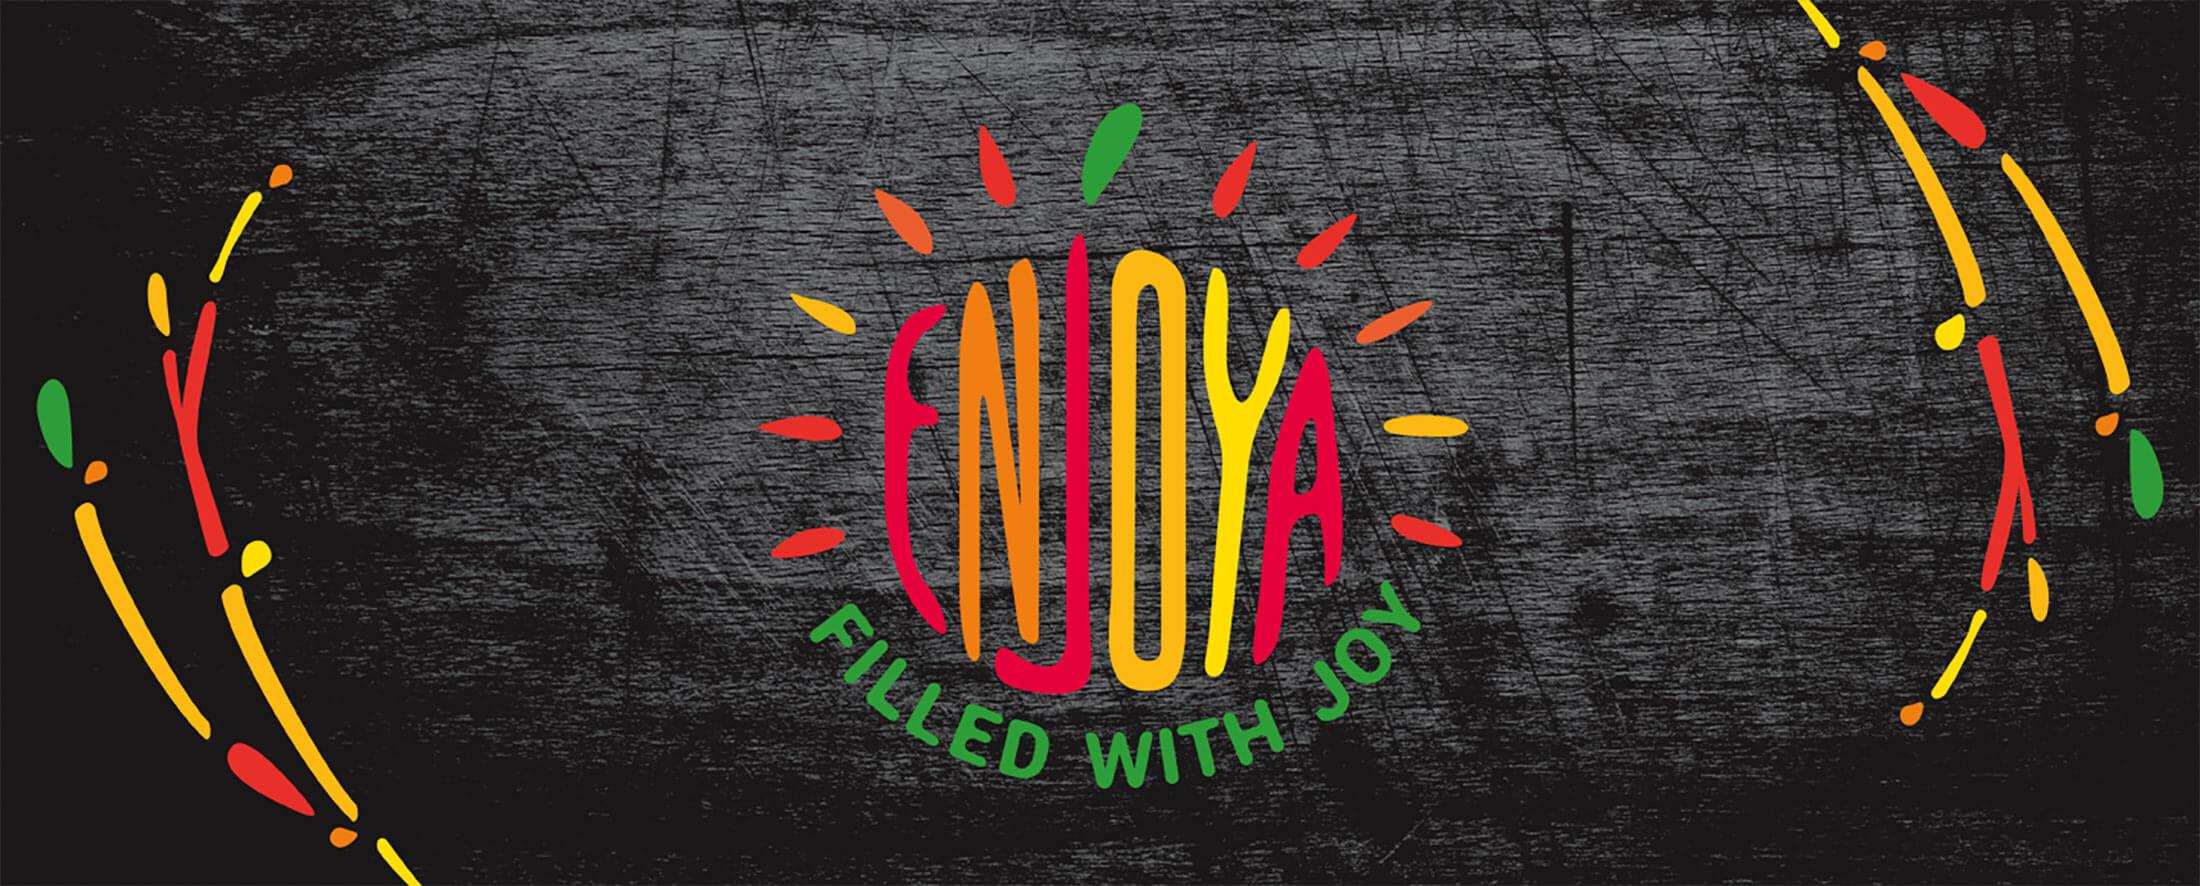 Enjoya - corporate identity